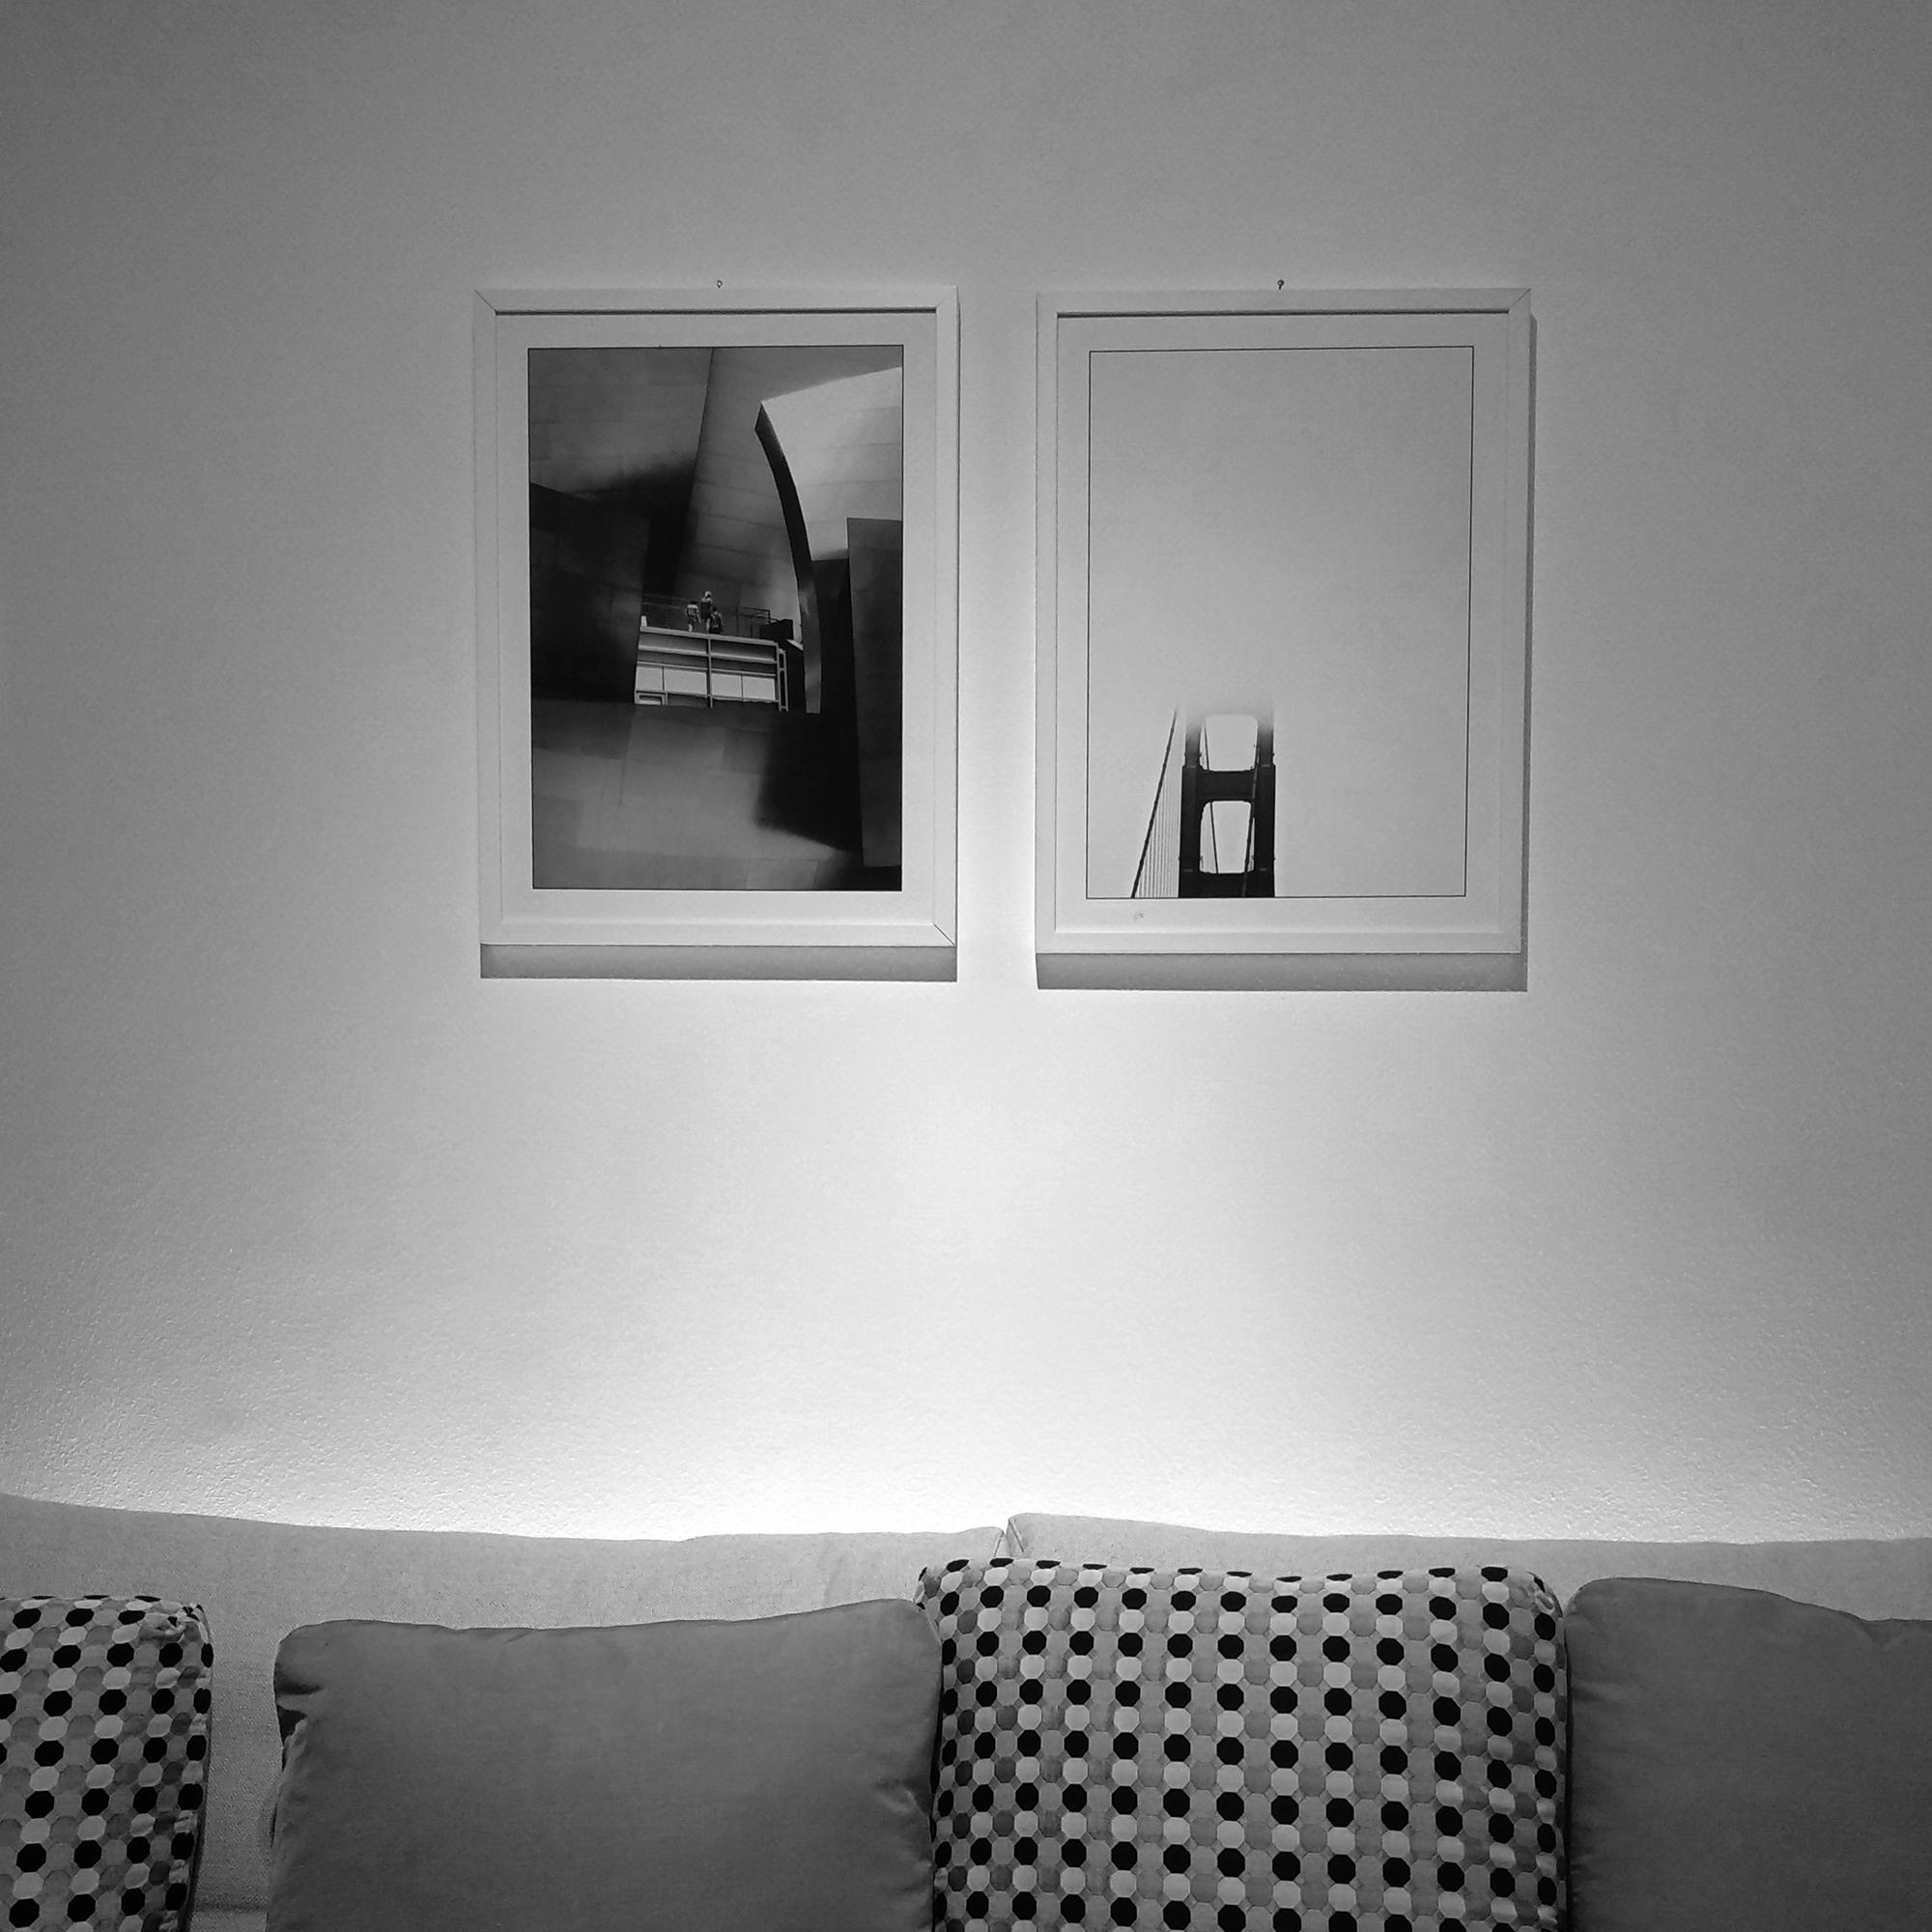 umberto_mauri_architetto_mauri_studio_lago_pusiano_como_bosisio_parini_private_renovation_house_residential_2000_05